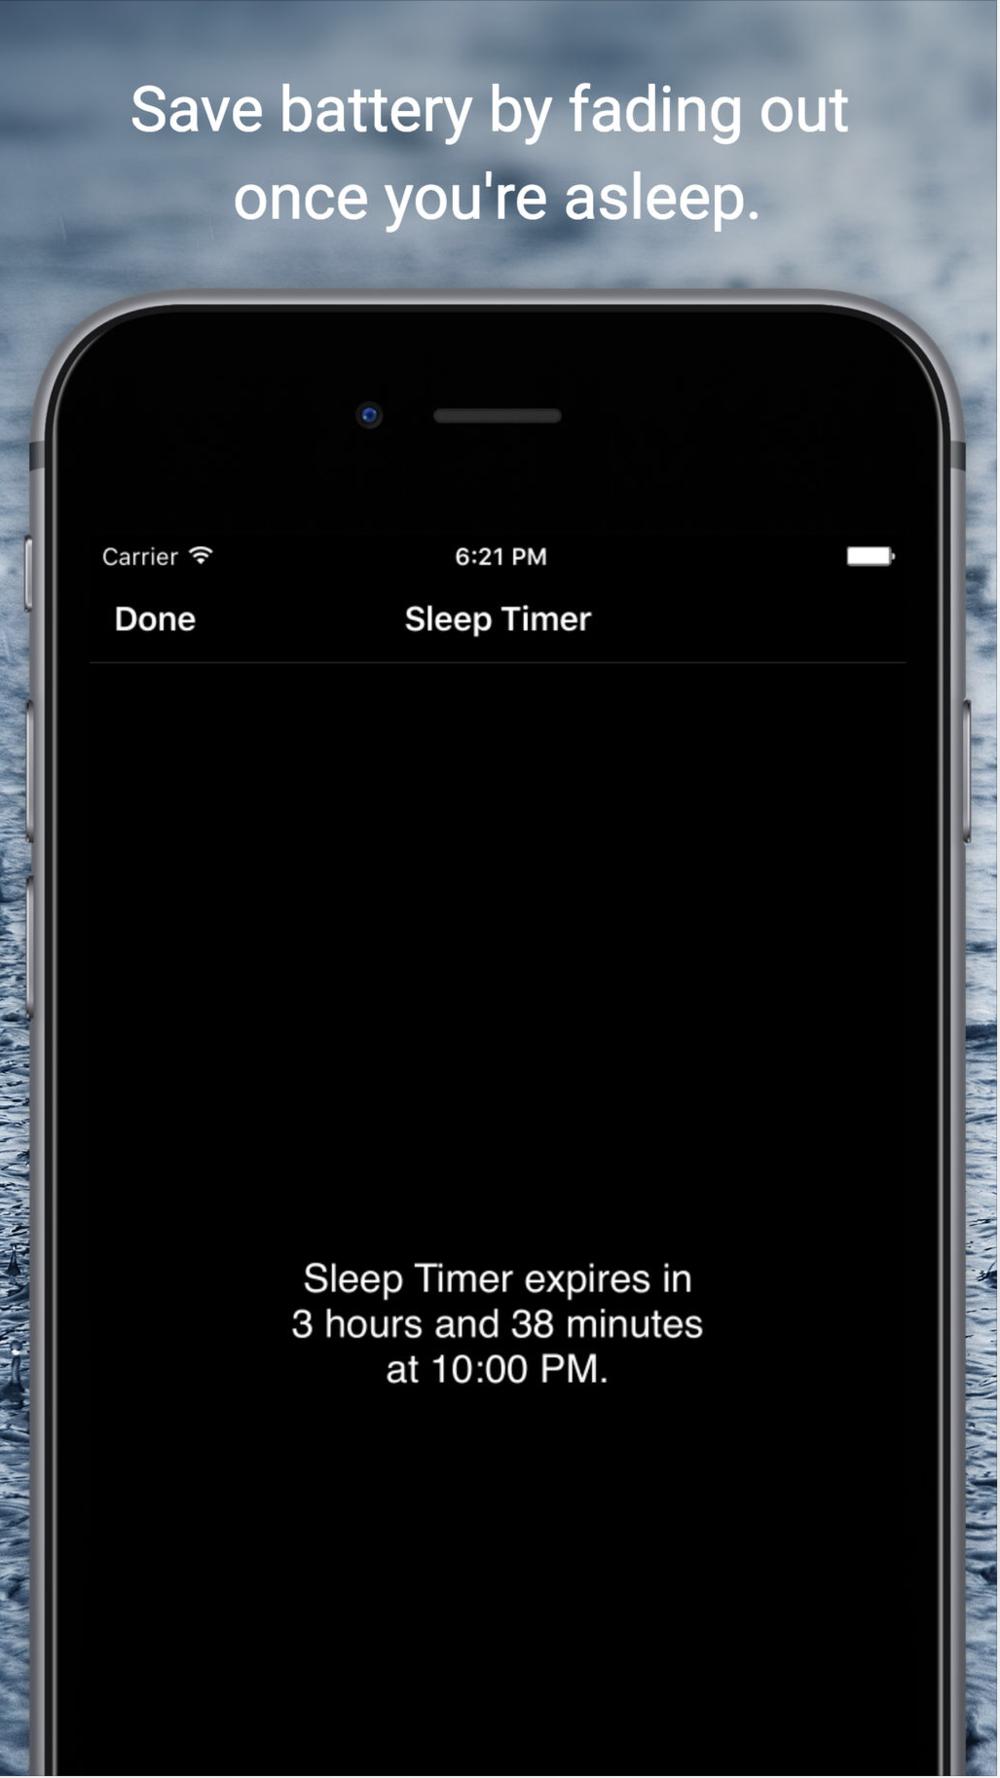 sam-c-perry-3-products-that-will-help-you-sleep-better-rain-rain-app-image-4.jpg